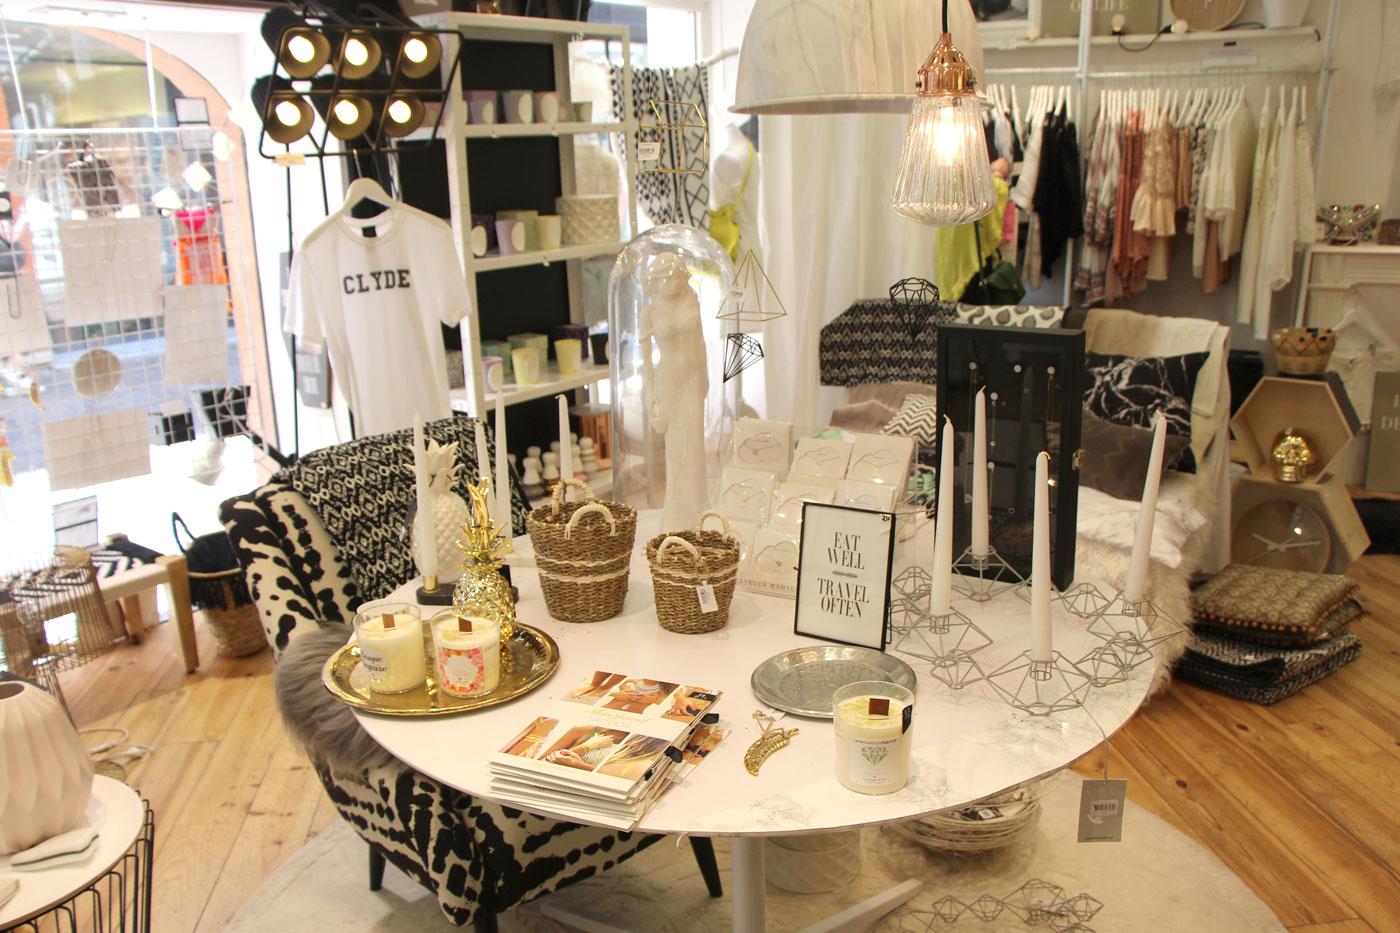 toulouse magasin appartement de penelope stephanie caumont 2 dkomag. Black Bedroom Furniture Sets. Home Design Ideas